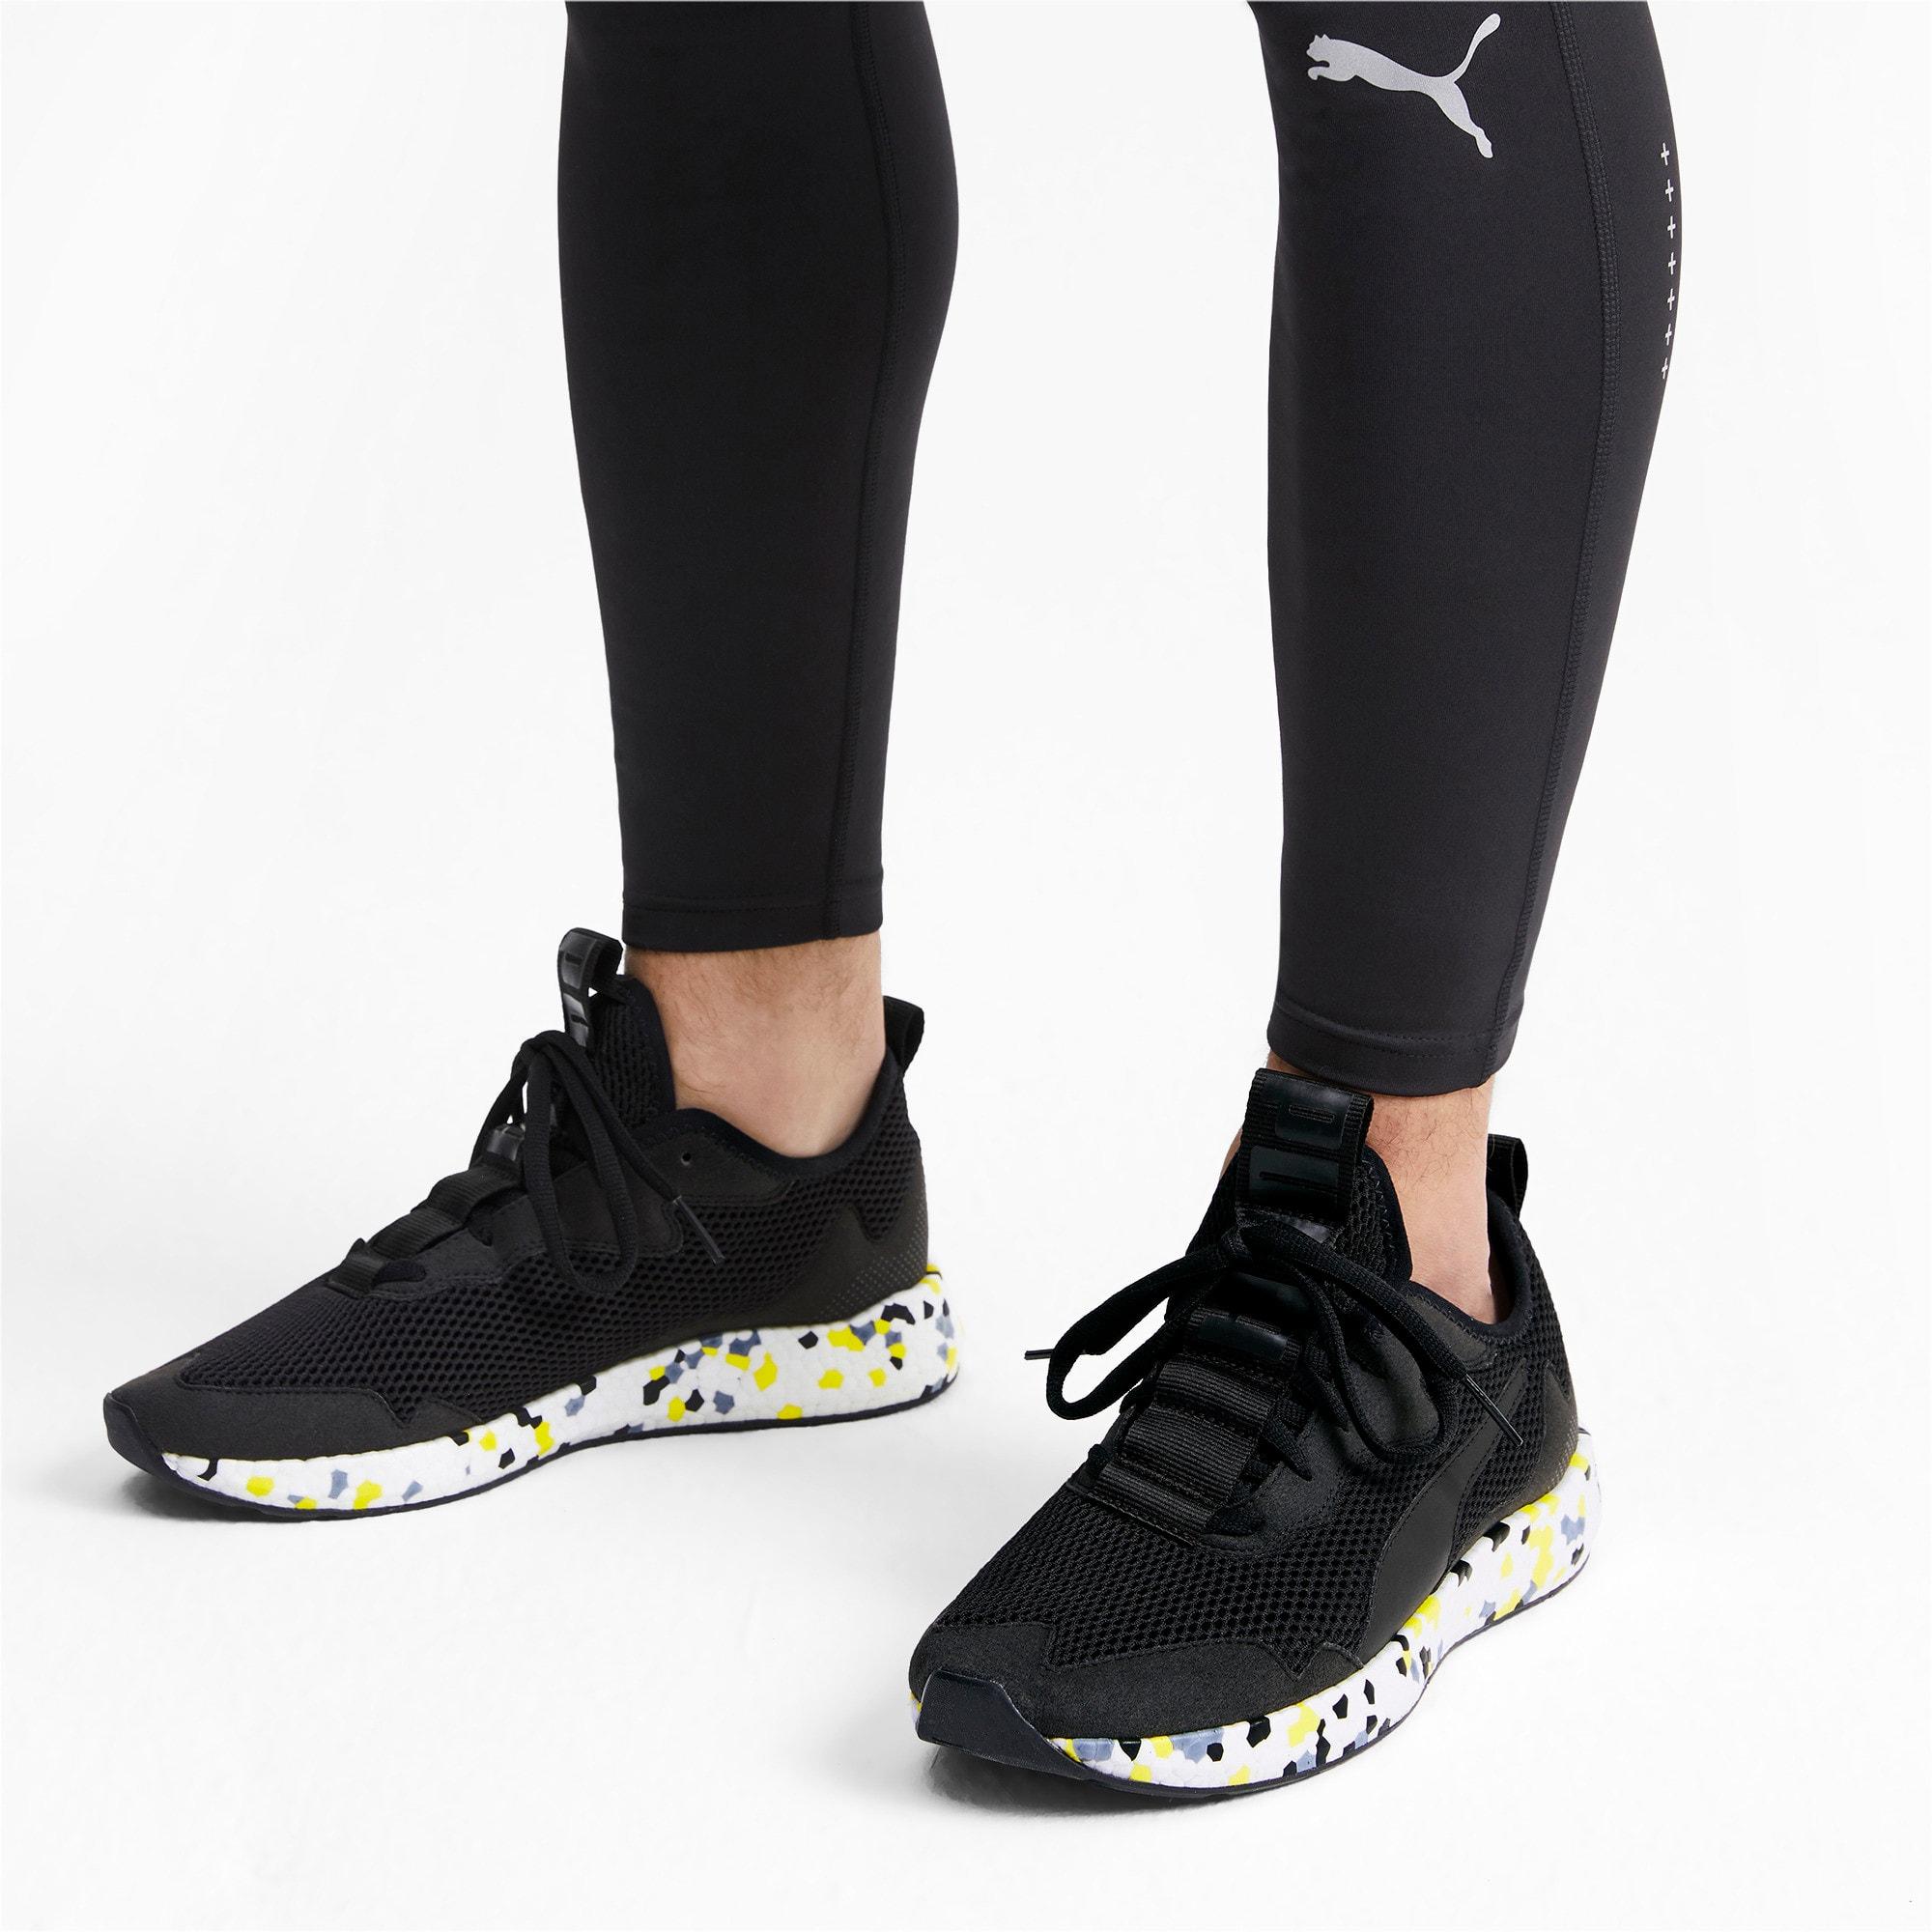 Thumbnail 3 of NRGY Neko Skim Men's Running Shoes, Puma Black-Yellow Alert, medium-IND